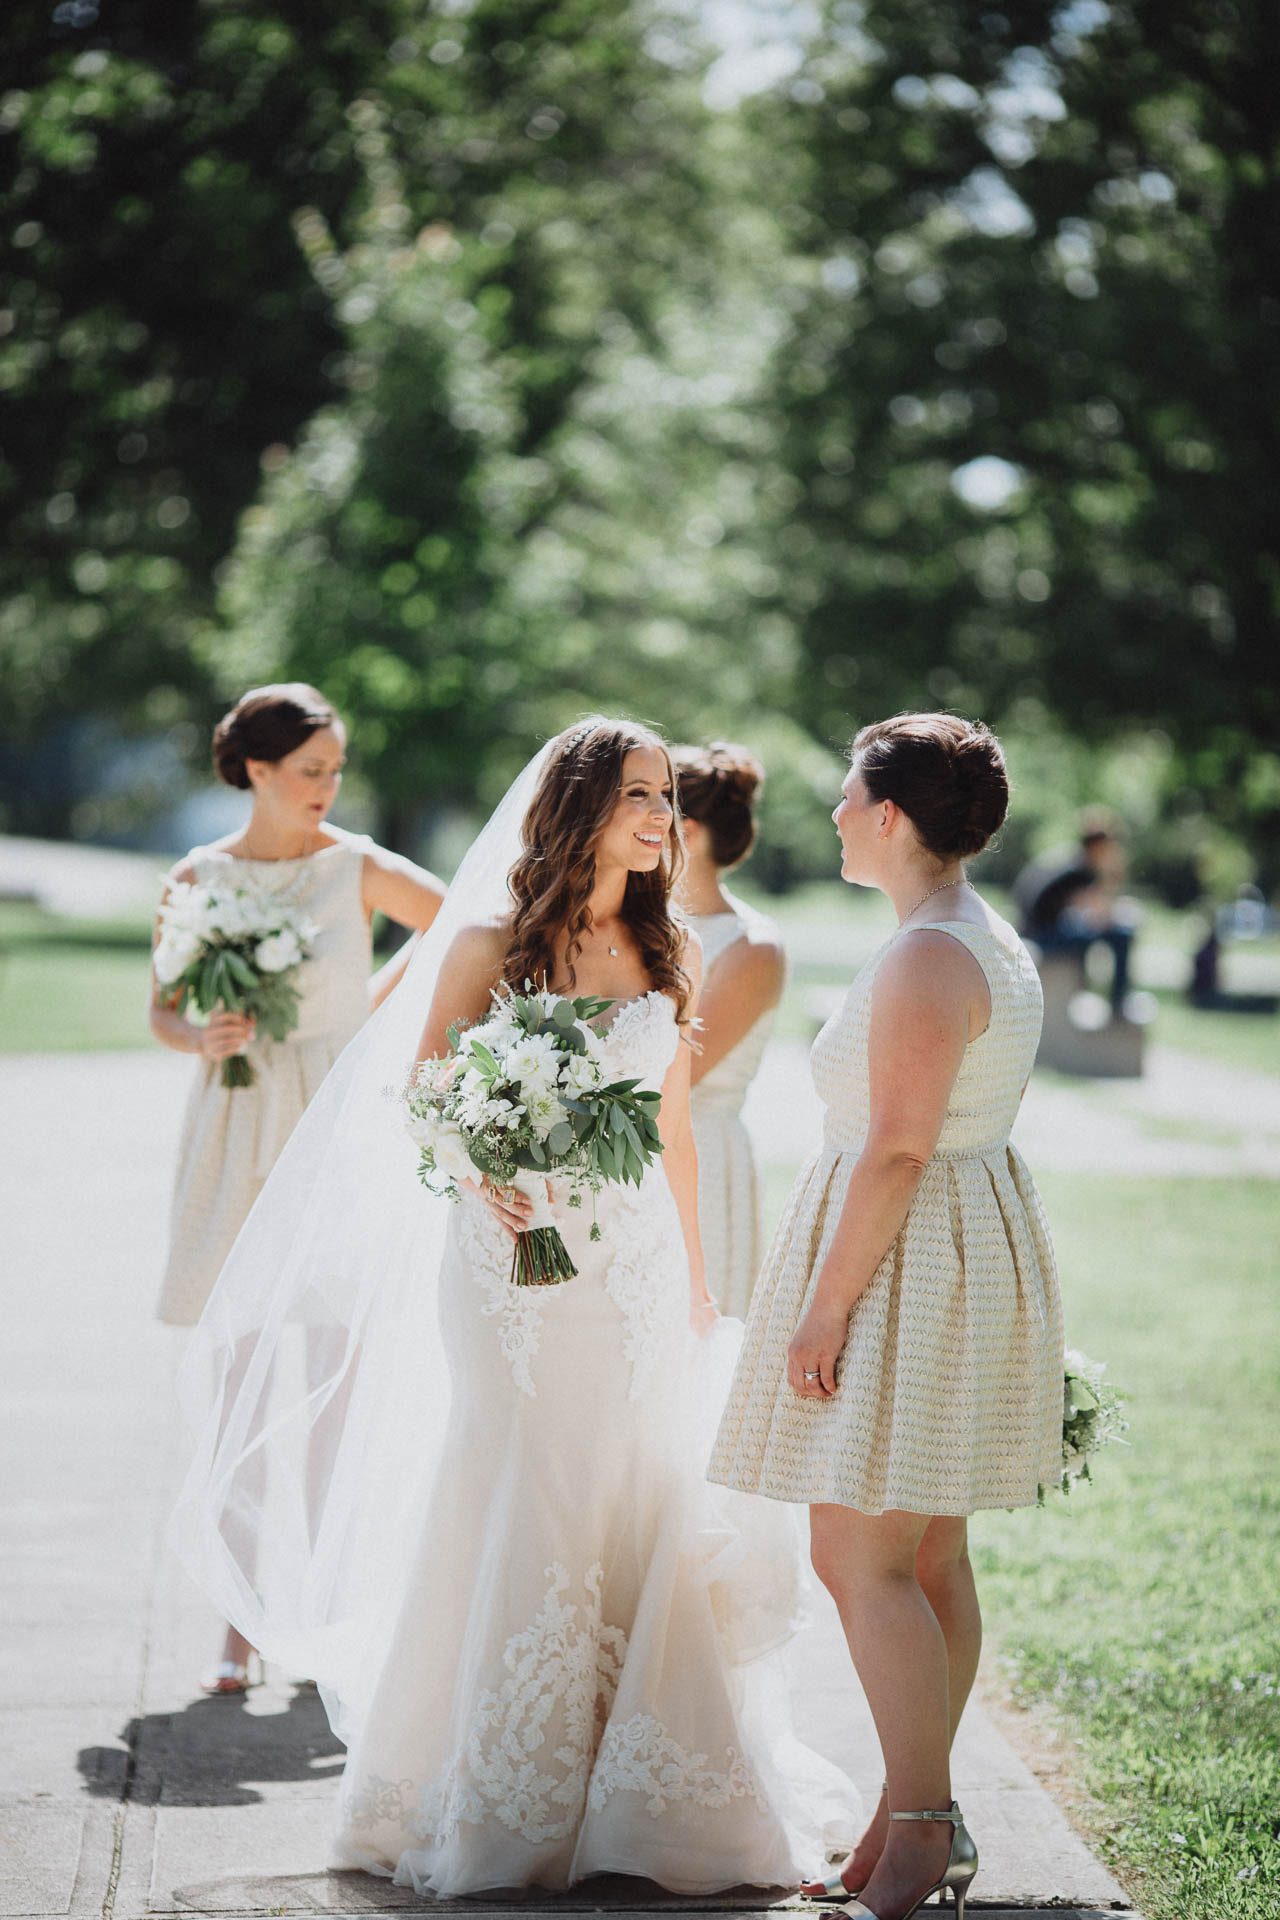 Keri-Joseph-Top-of-the-Market-Wedding-208@2x.jpg